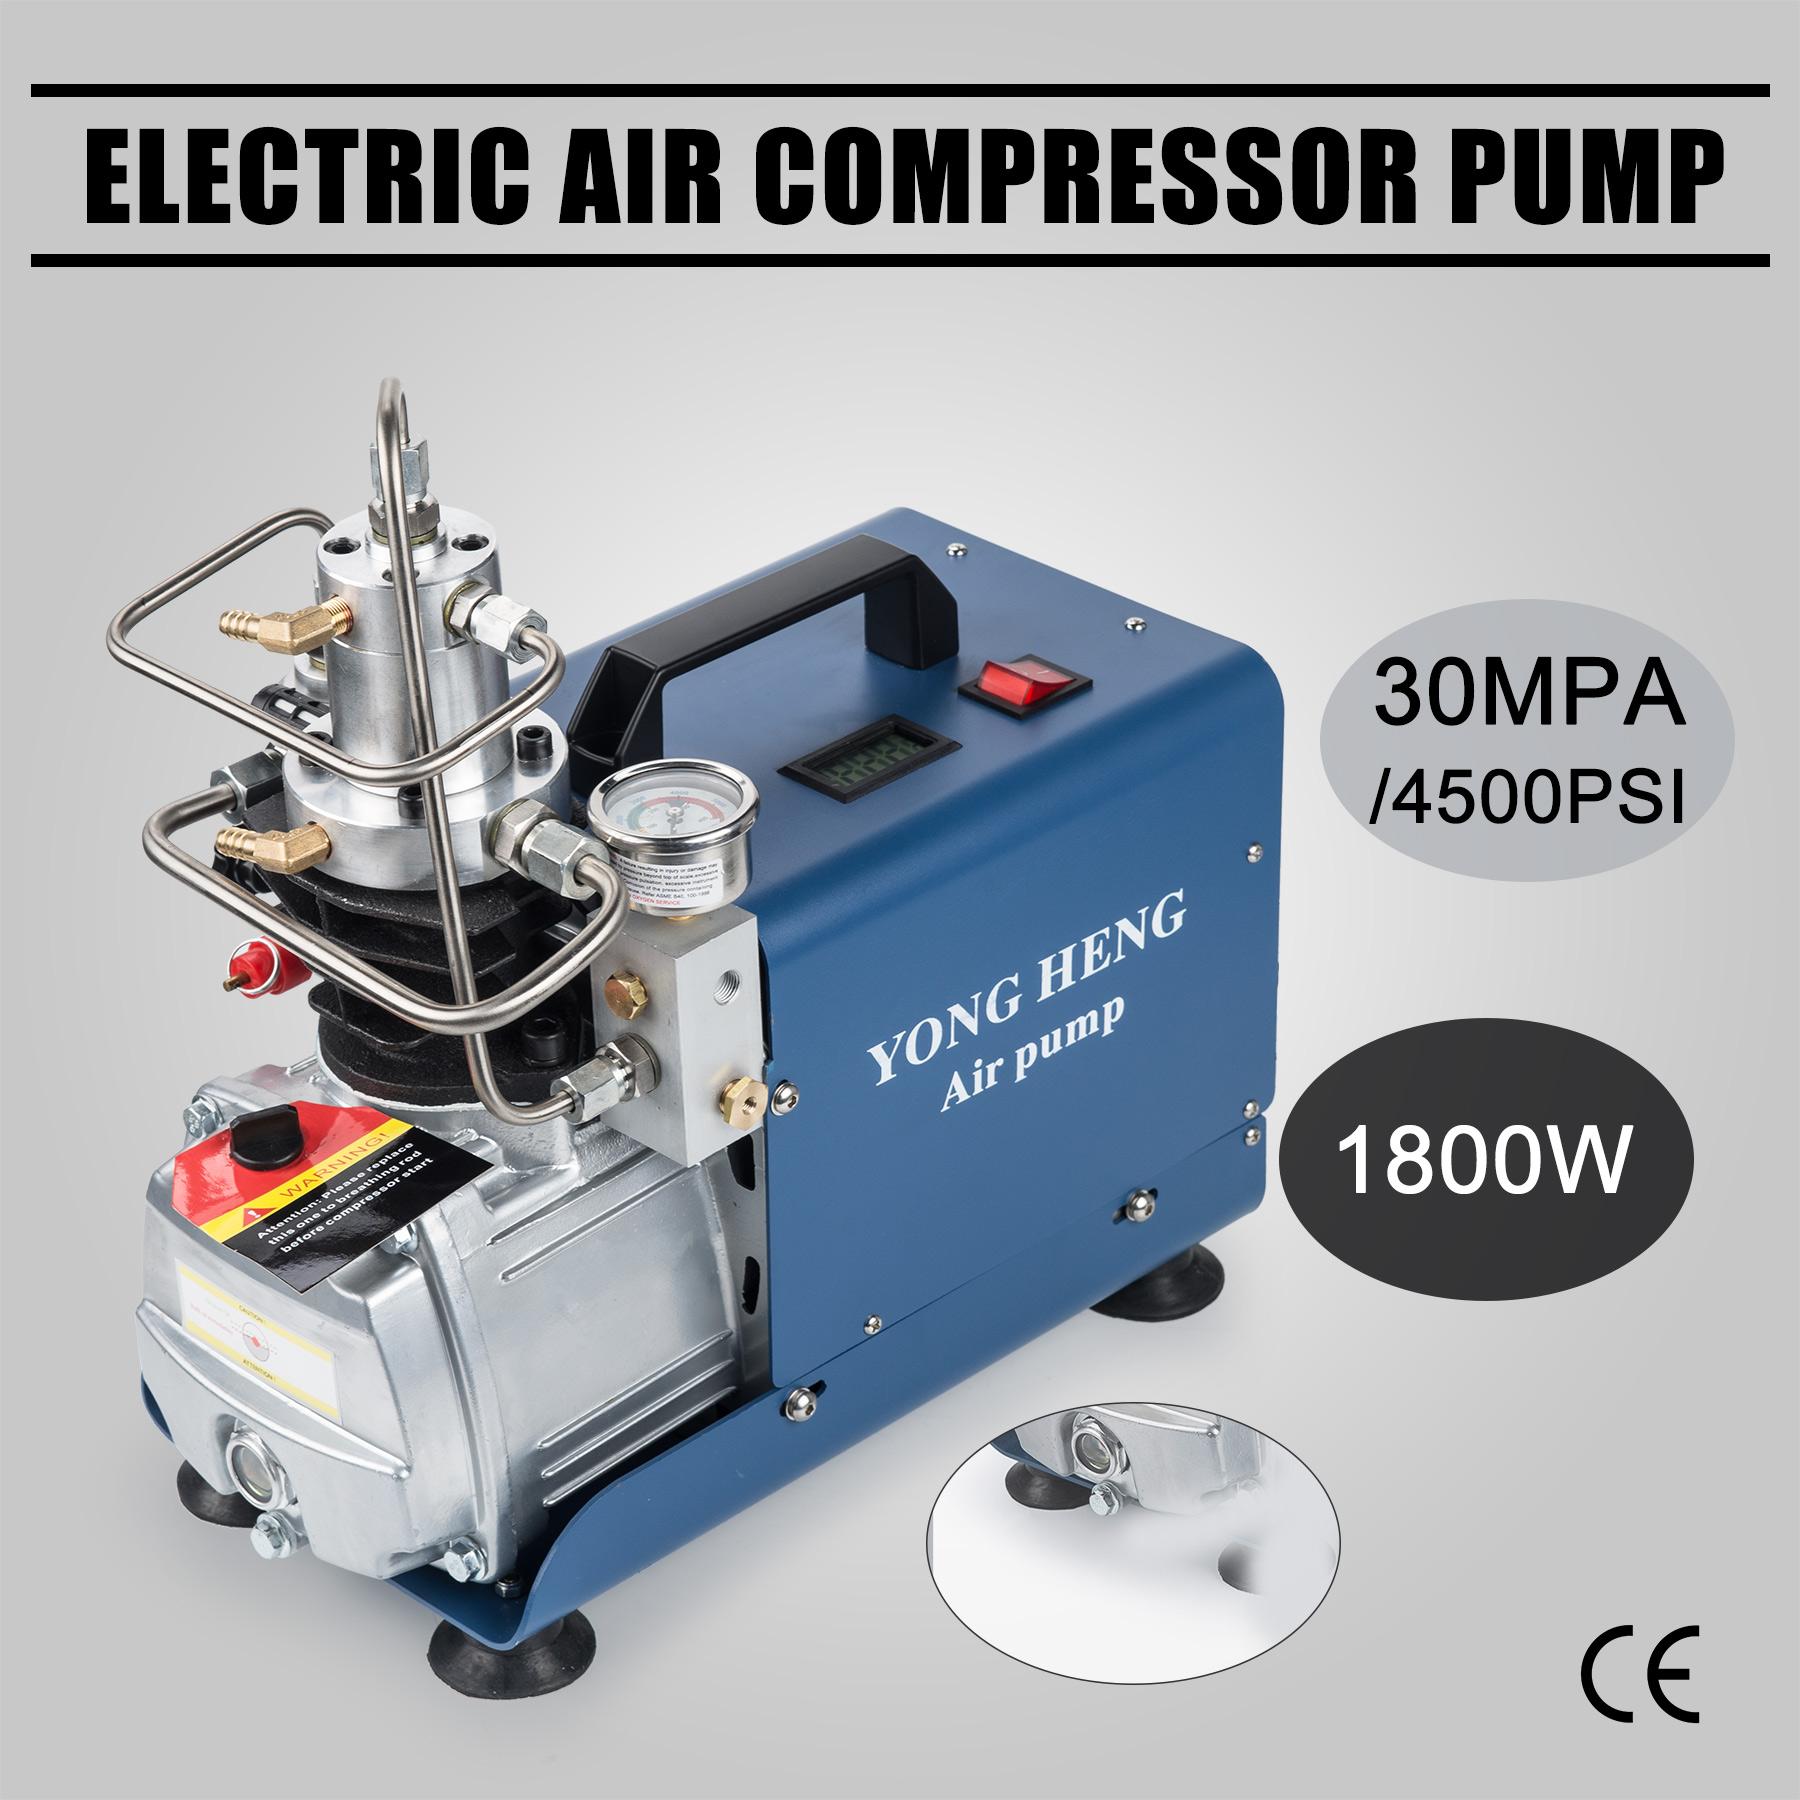 High Pressure Electric Air Compressor Pump 50 L / min 110V 30MPa